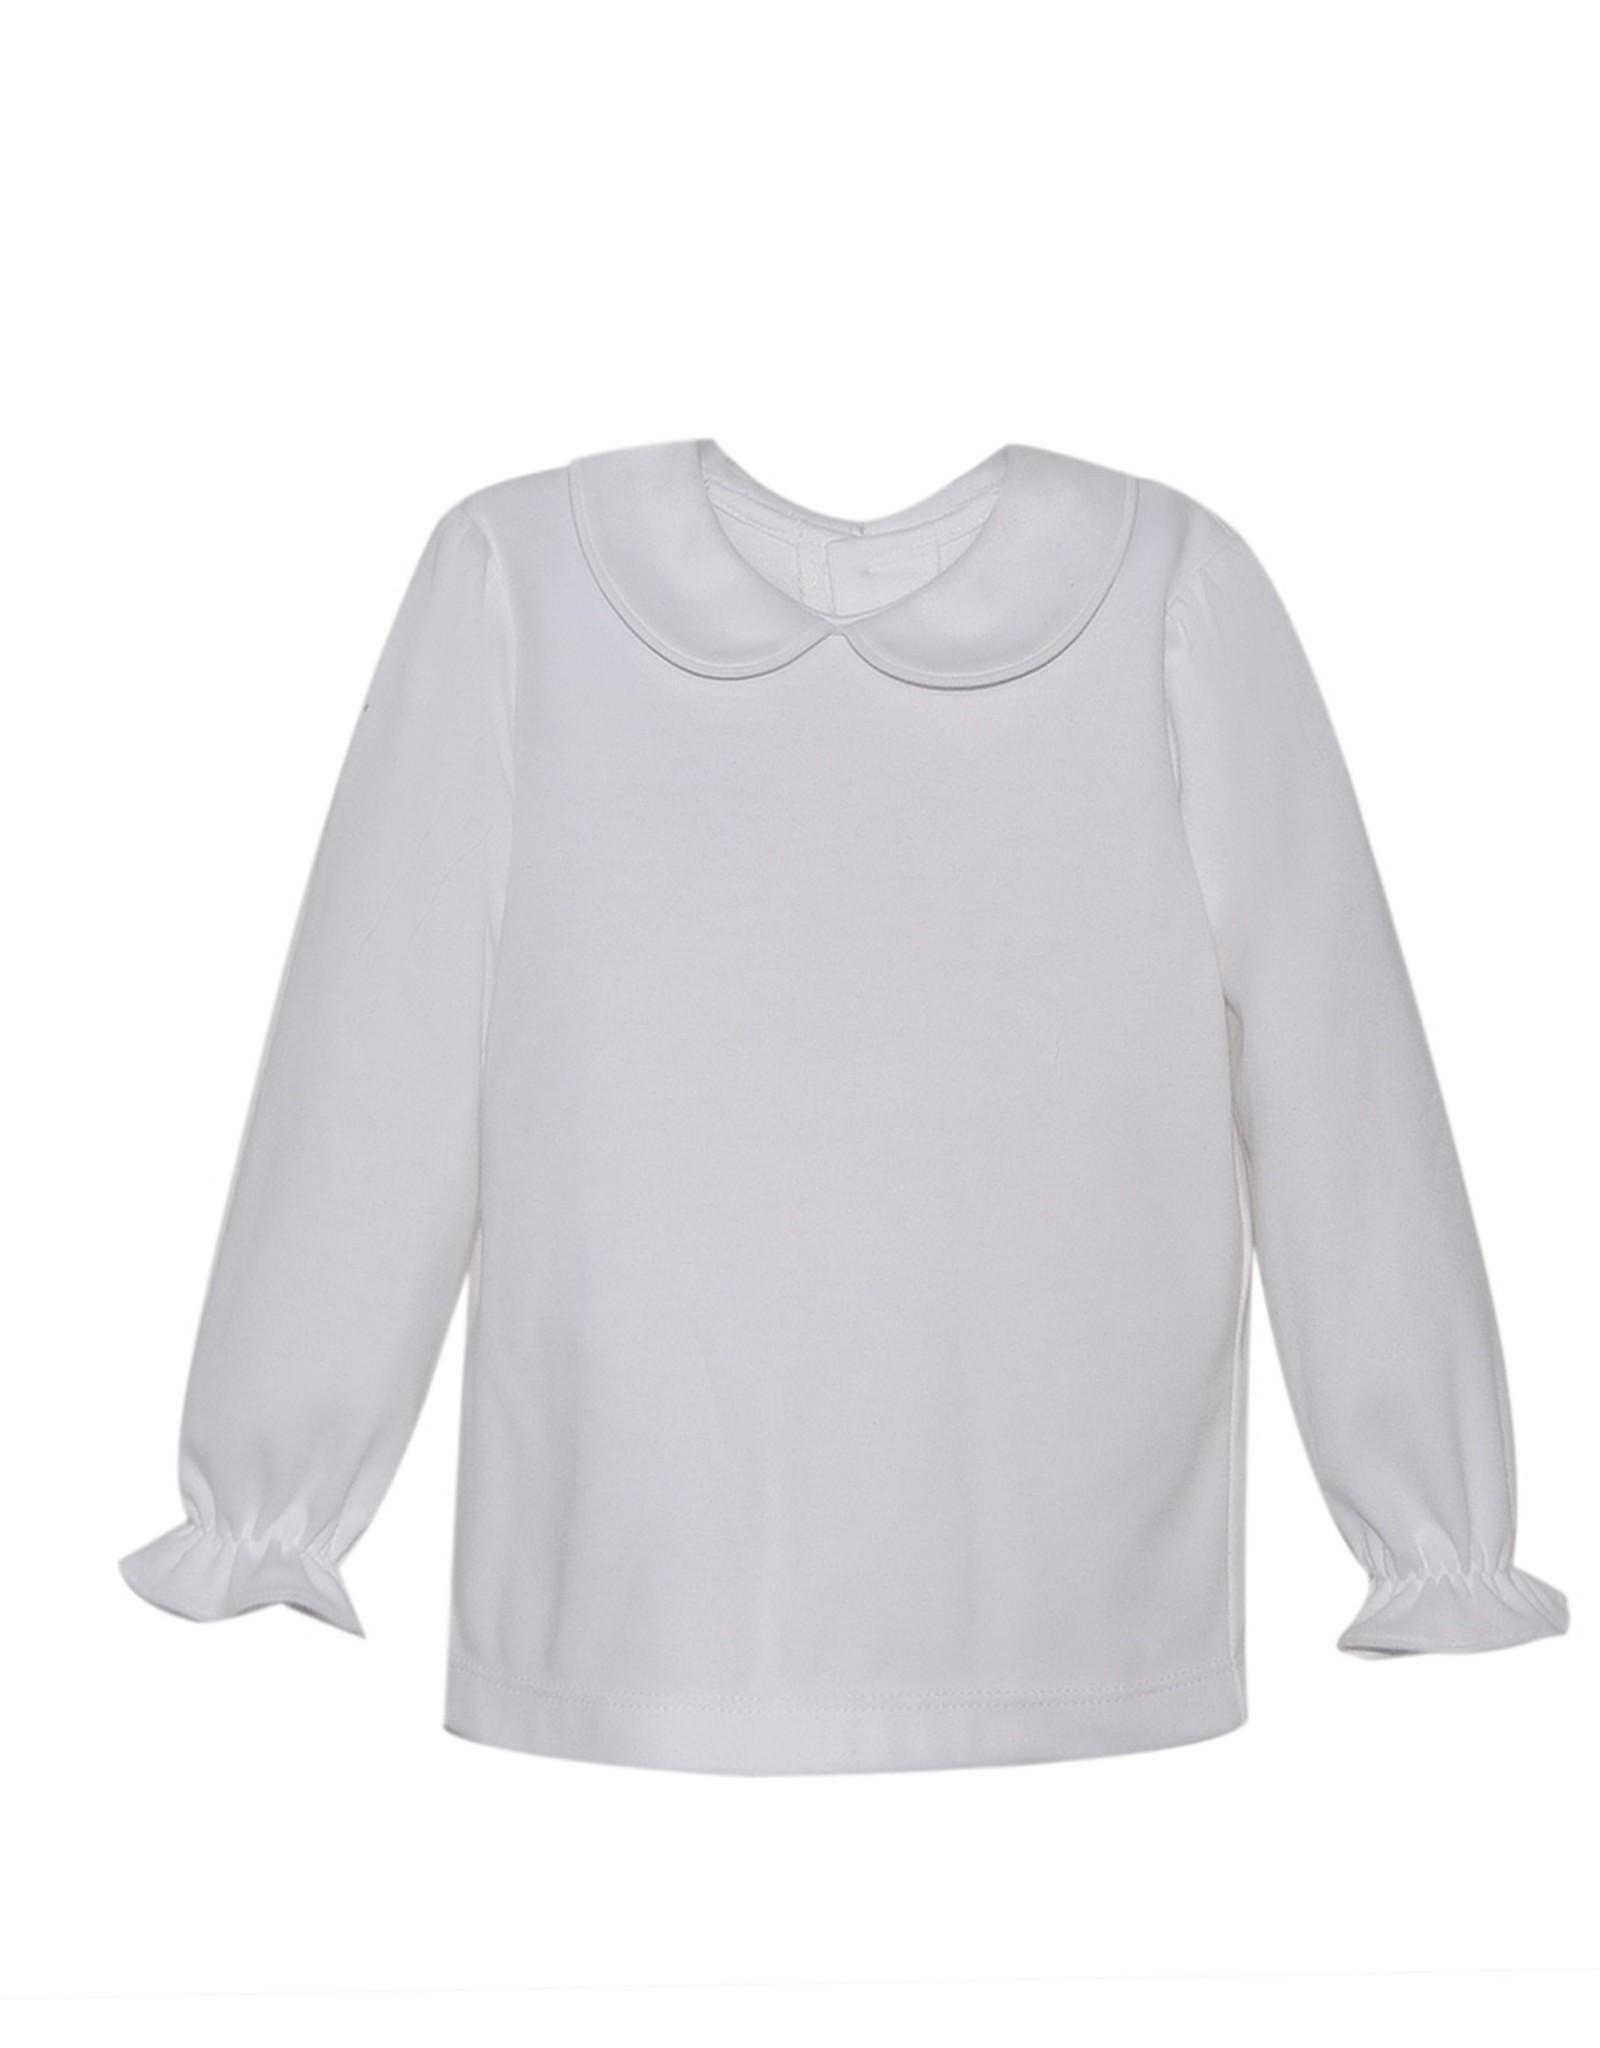 Remember Nguyen Girls Knit White Long Sleeve Shirt